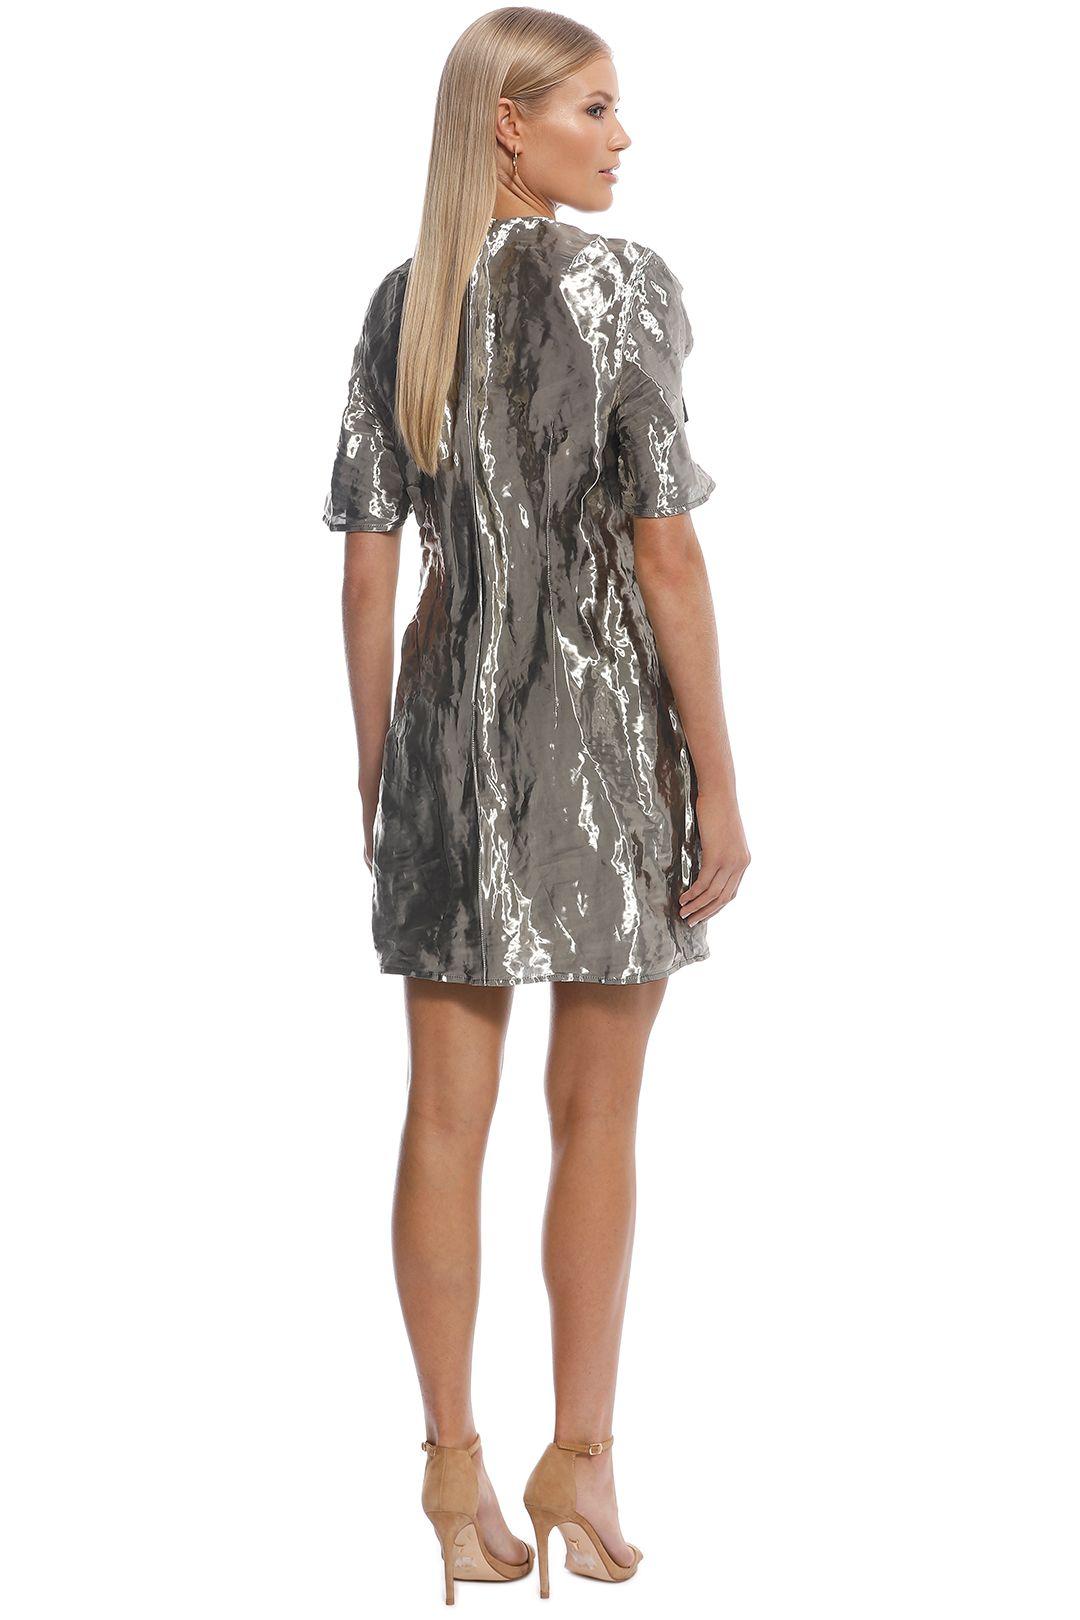 Ellery - Metal SS Mini Dress - Silver - Back